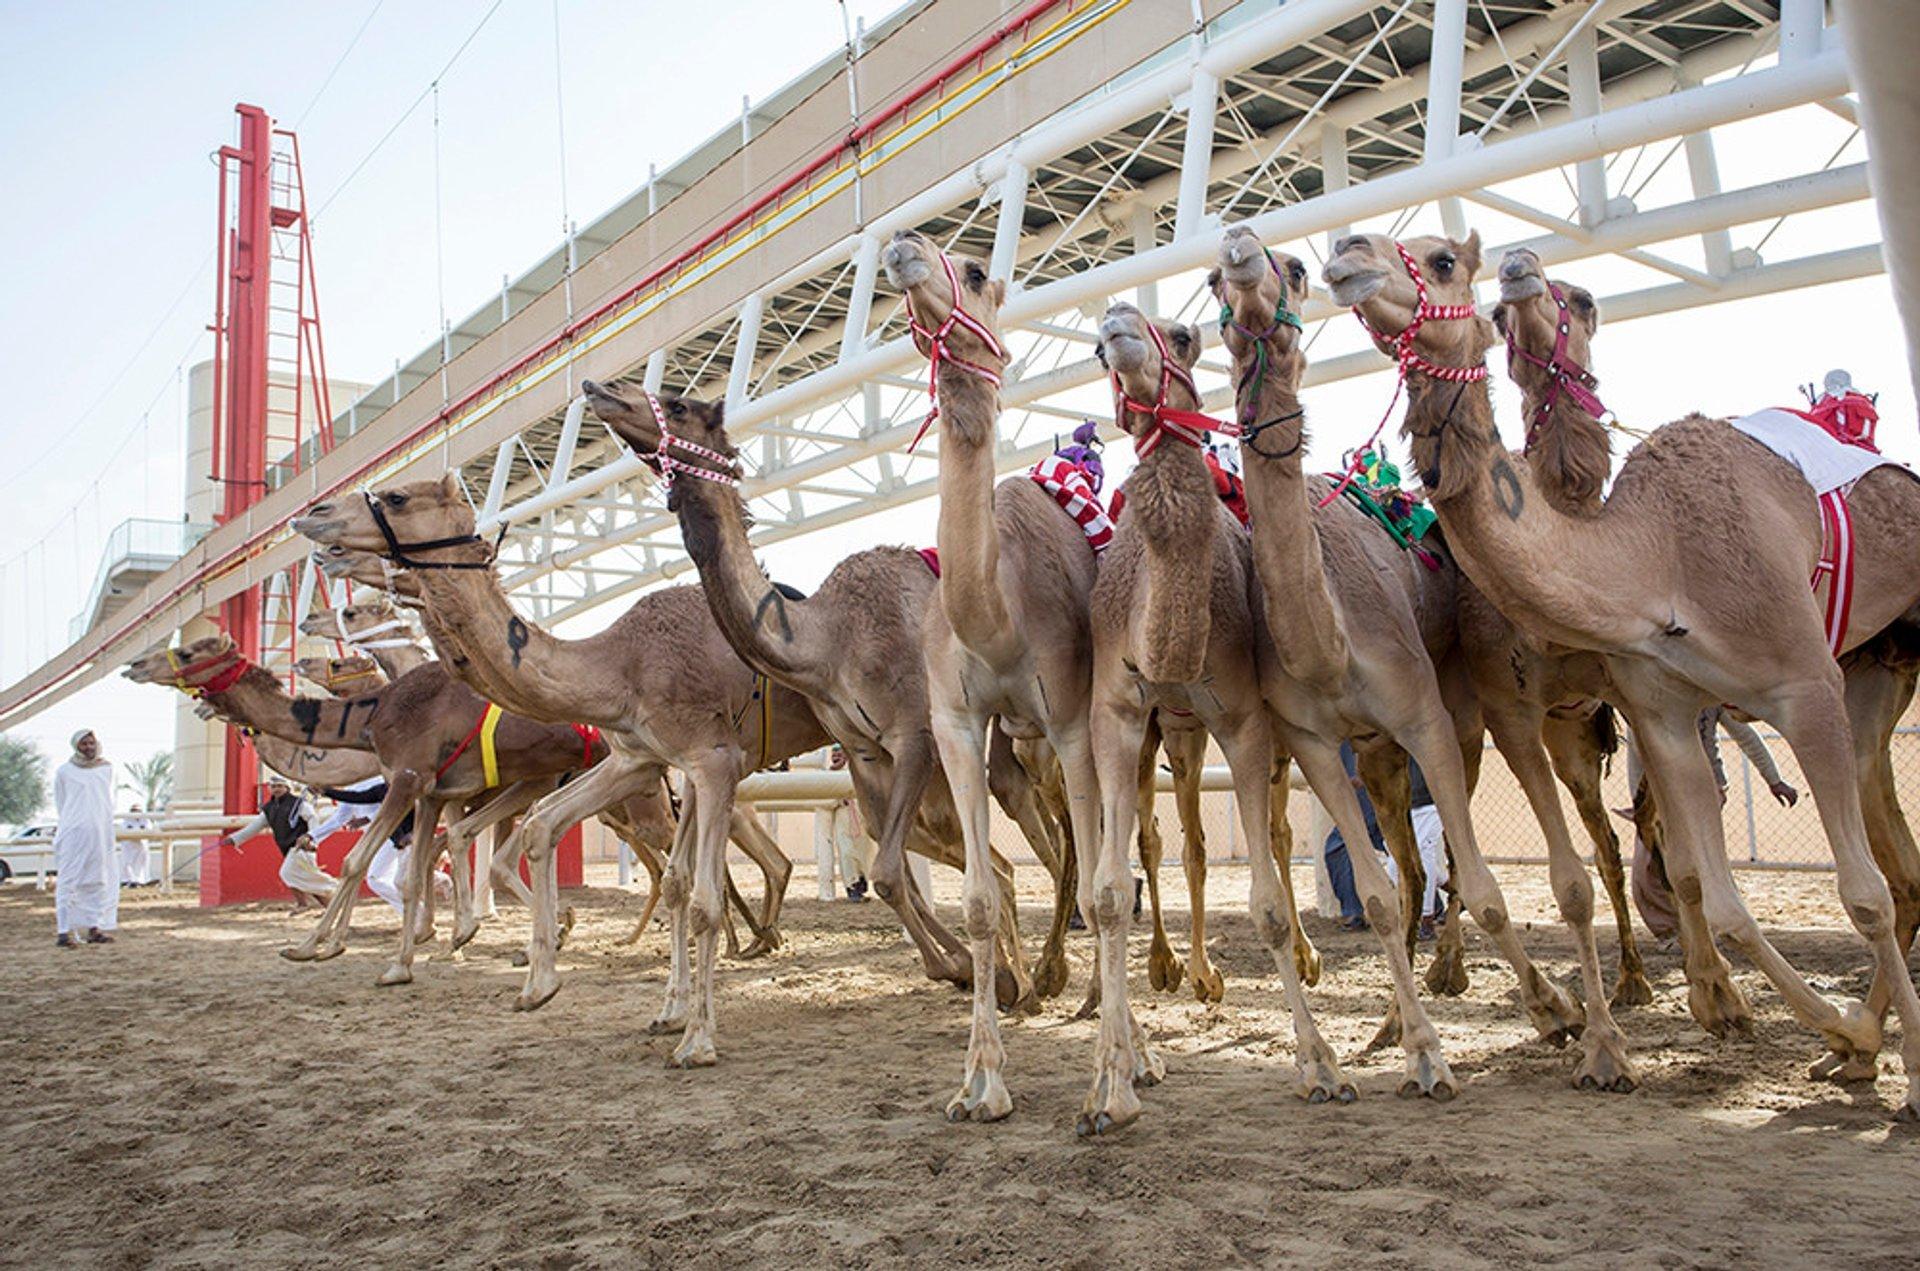 Camel Racing Season in Dubai - Best Season 2019